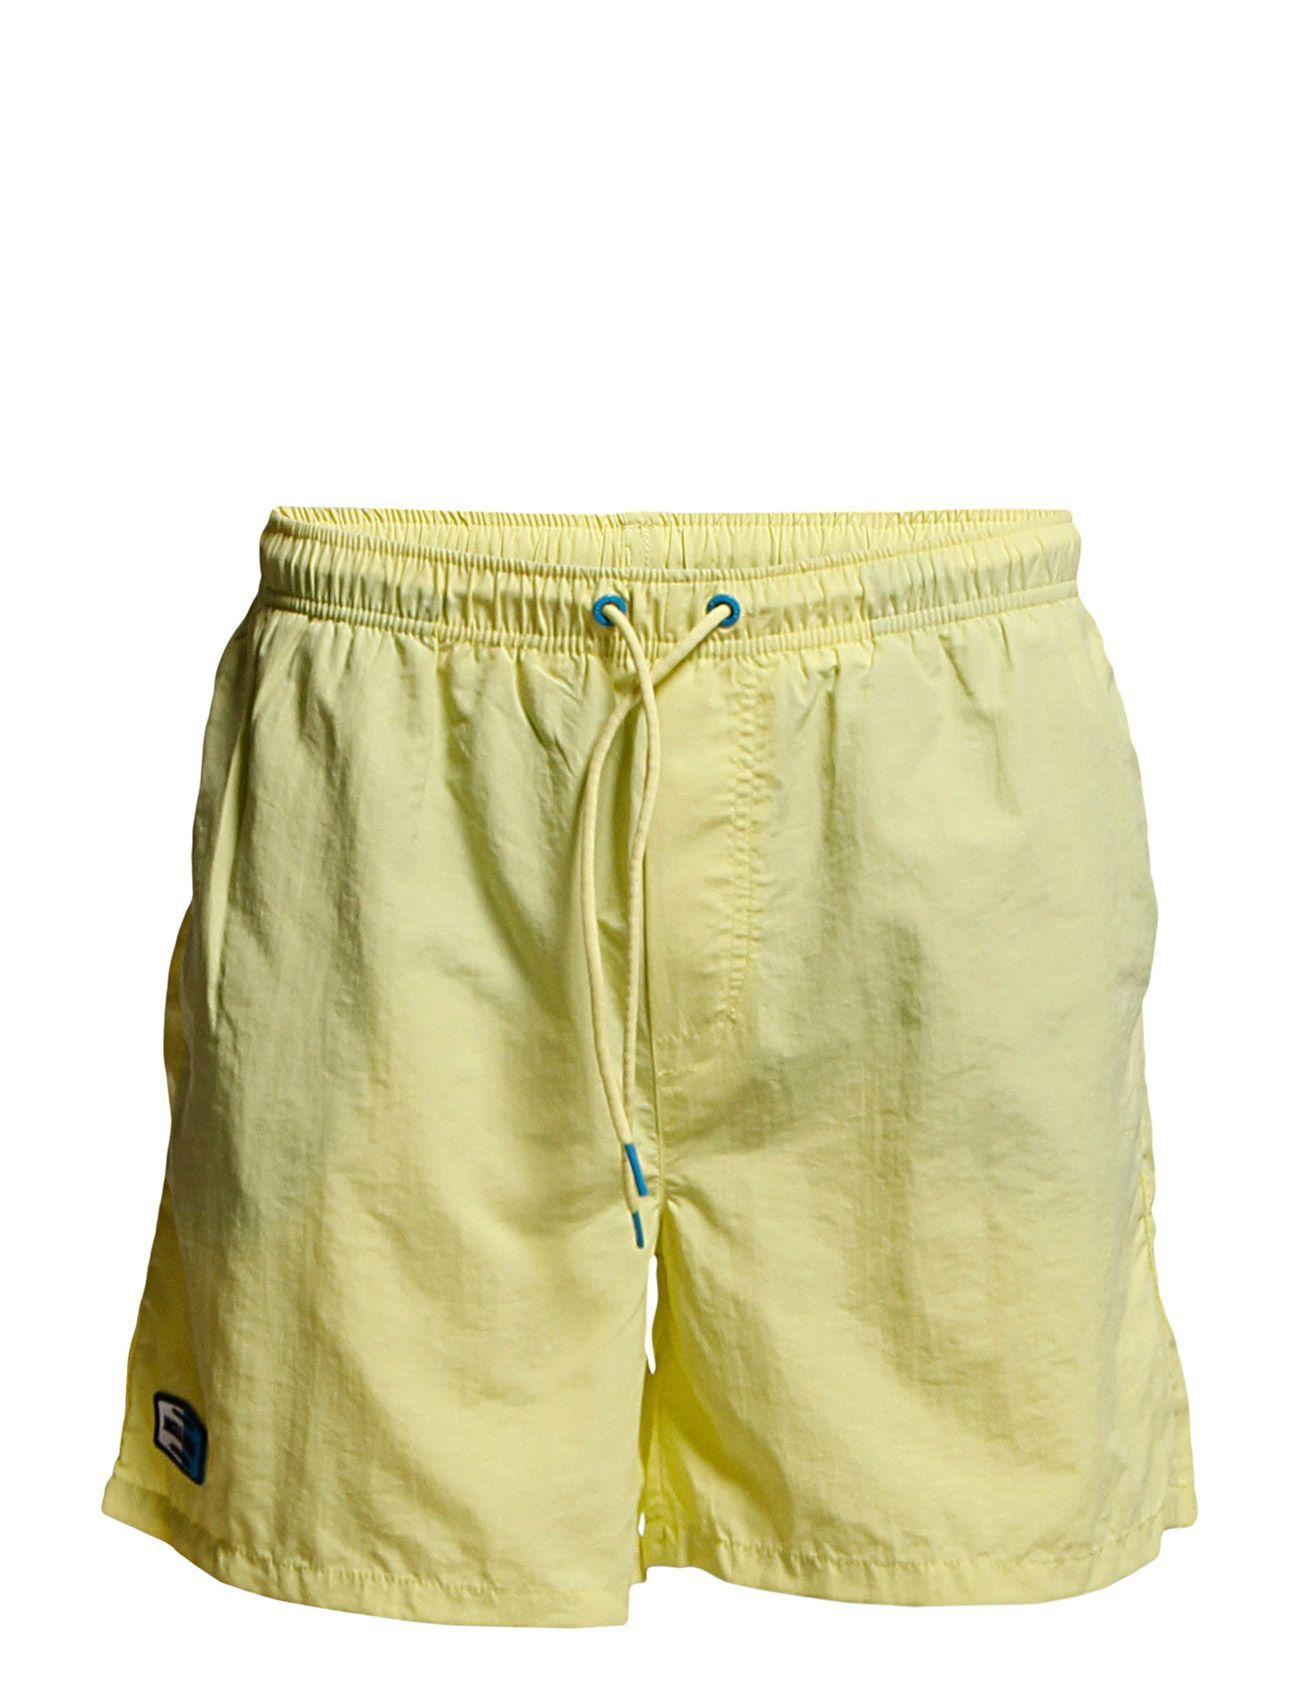 Seldom Shorts 4-5-6 12